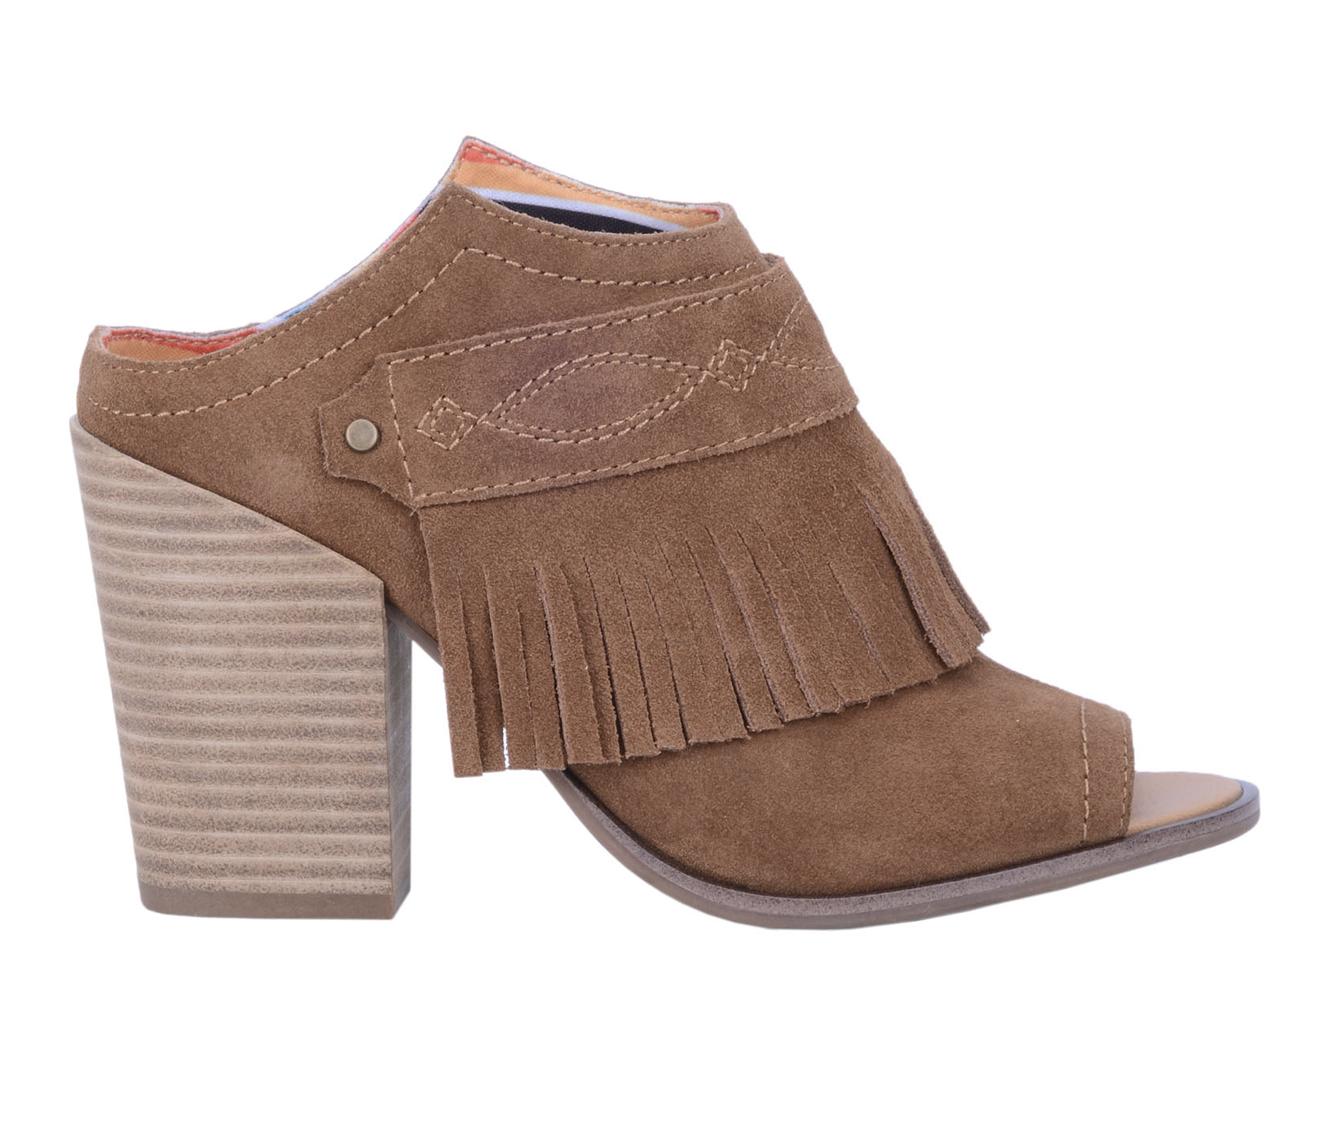 Dingo Boots Shaker Women's Dress Shoe (Brown - Leather)